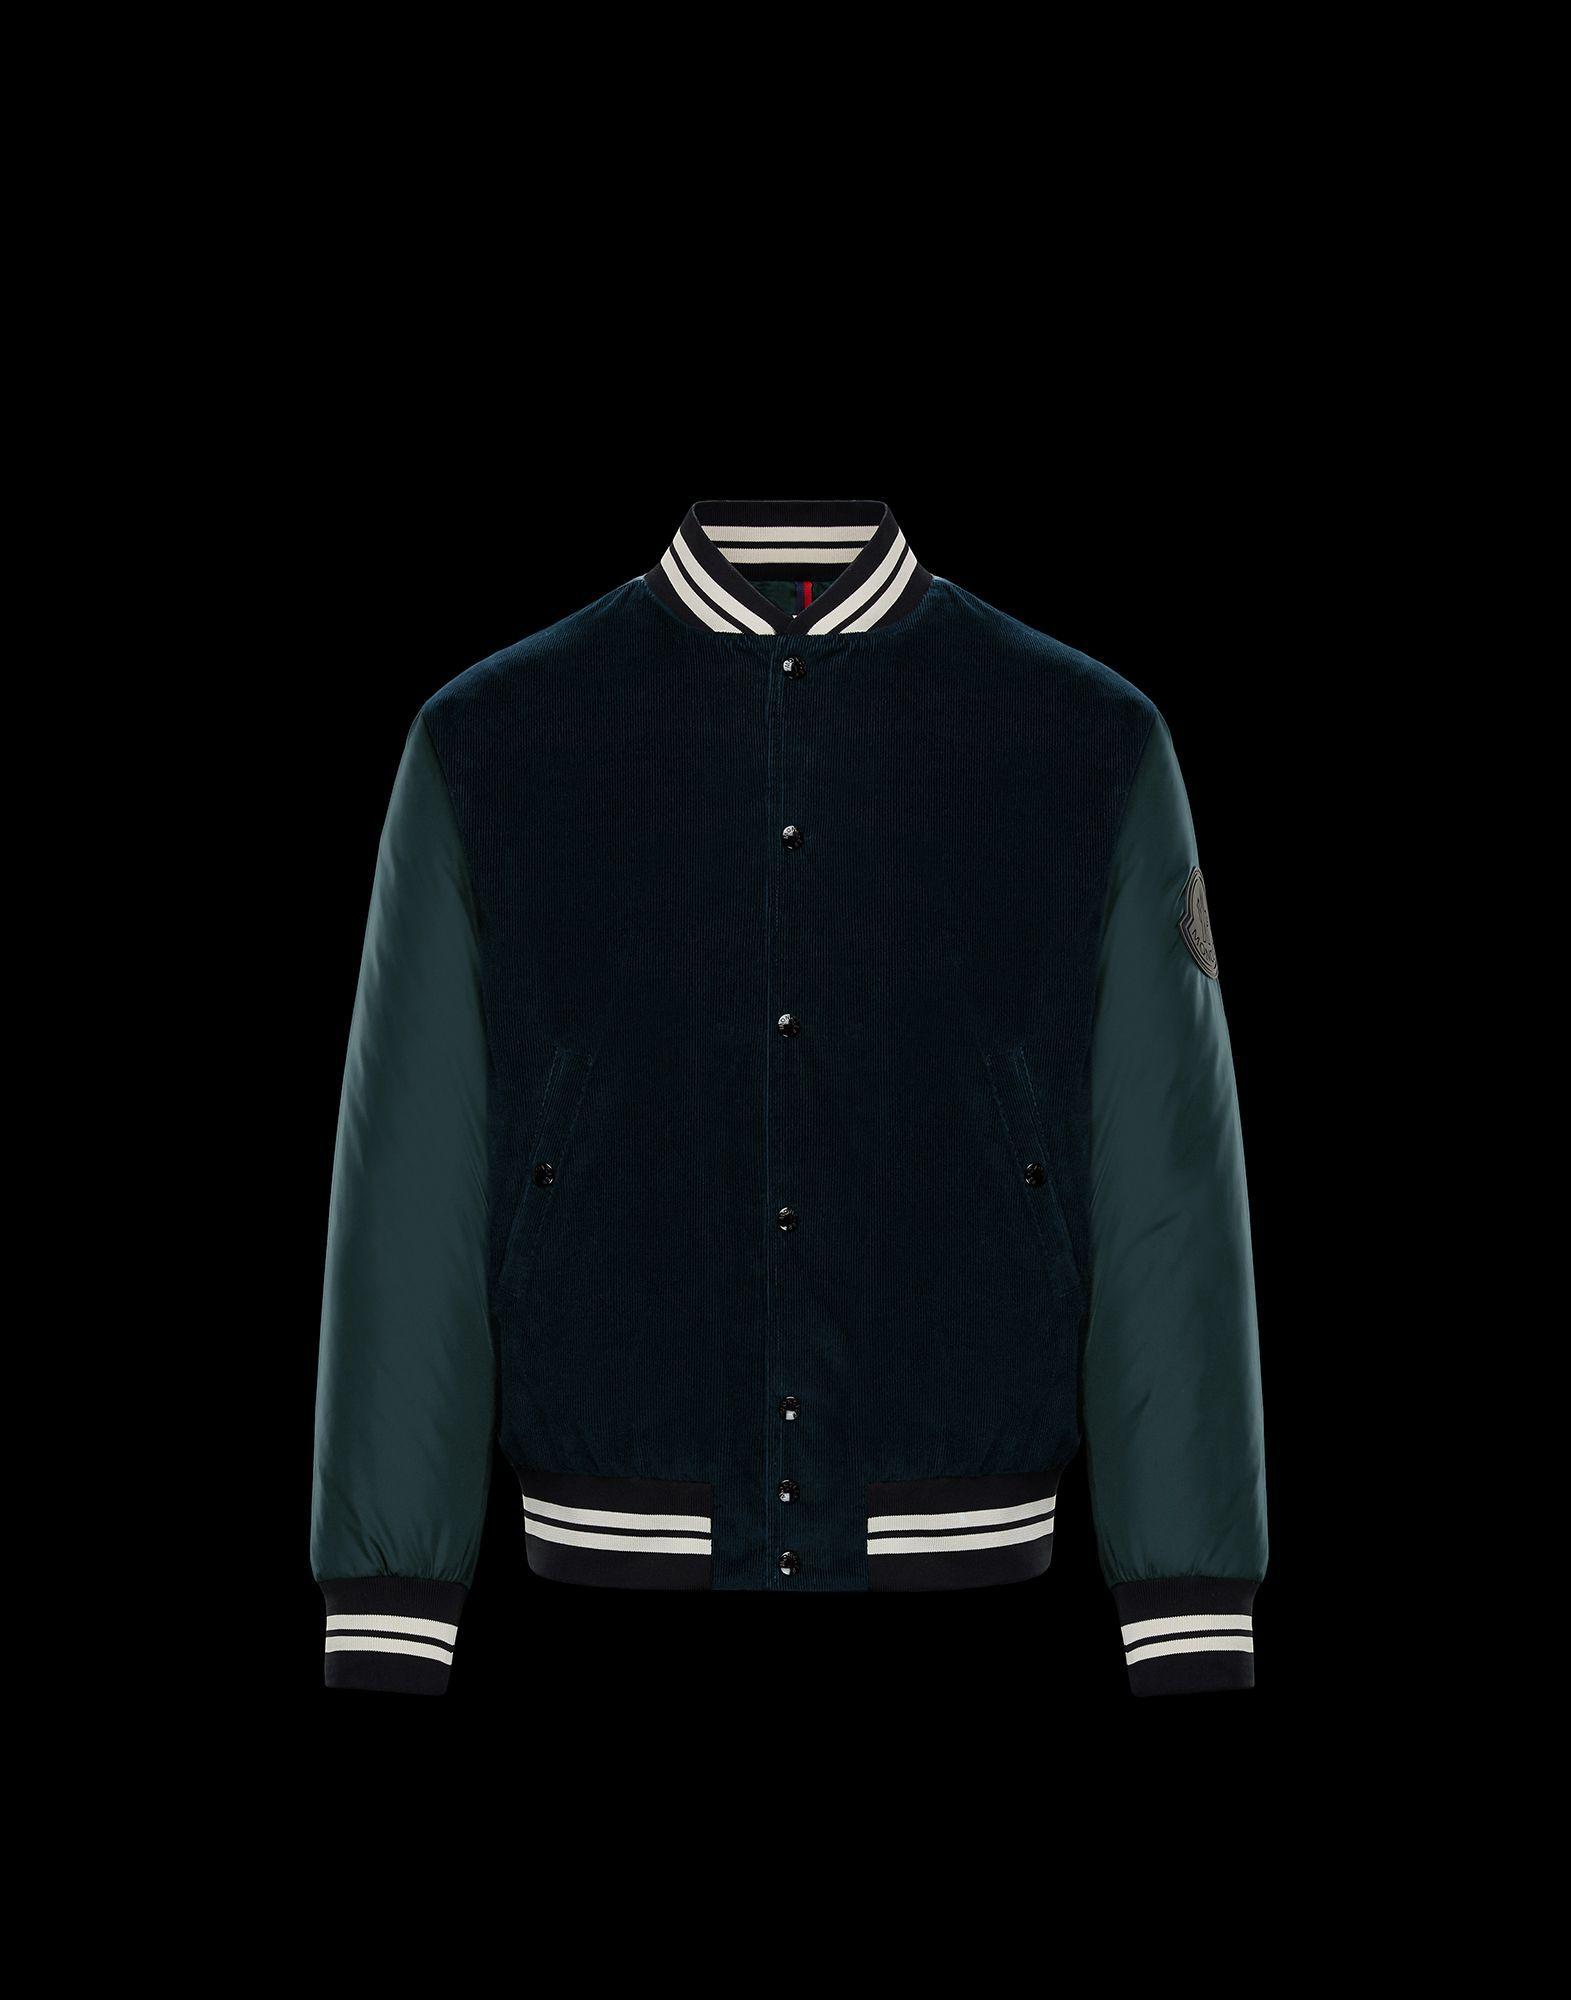 inverno invernali moda I uomo giacchetti imbottiti 10 2020